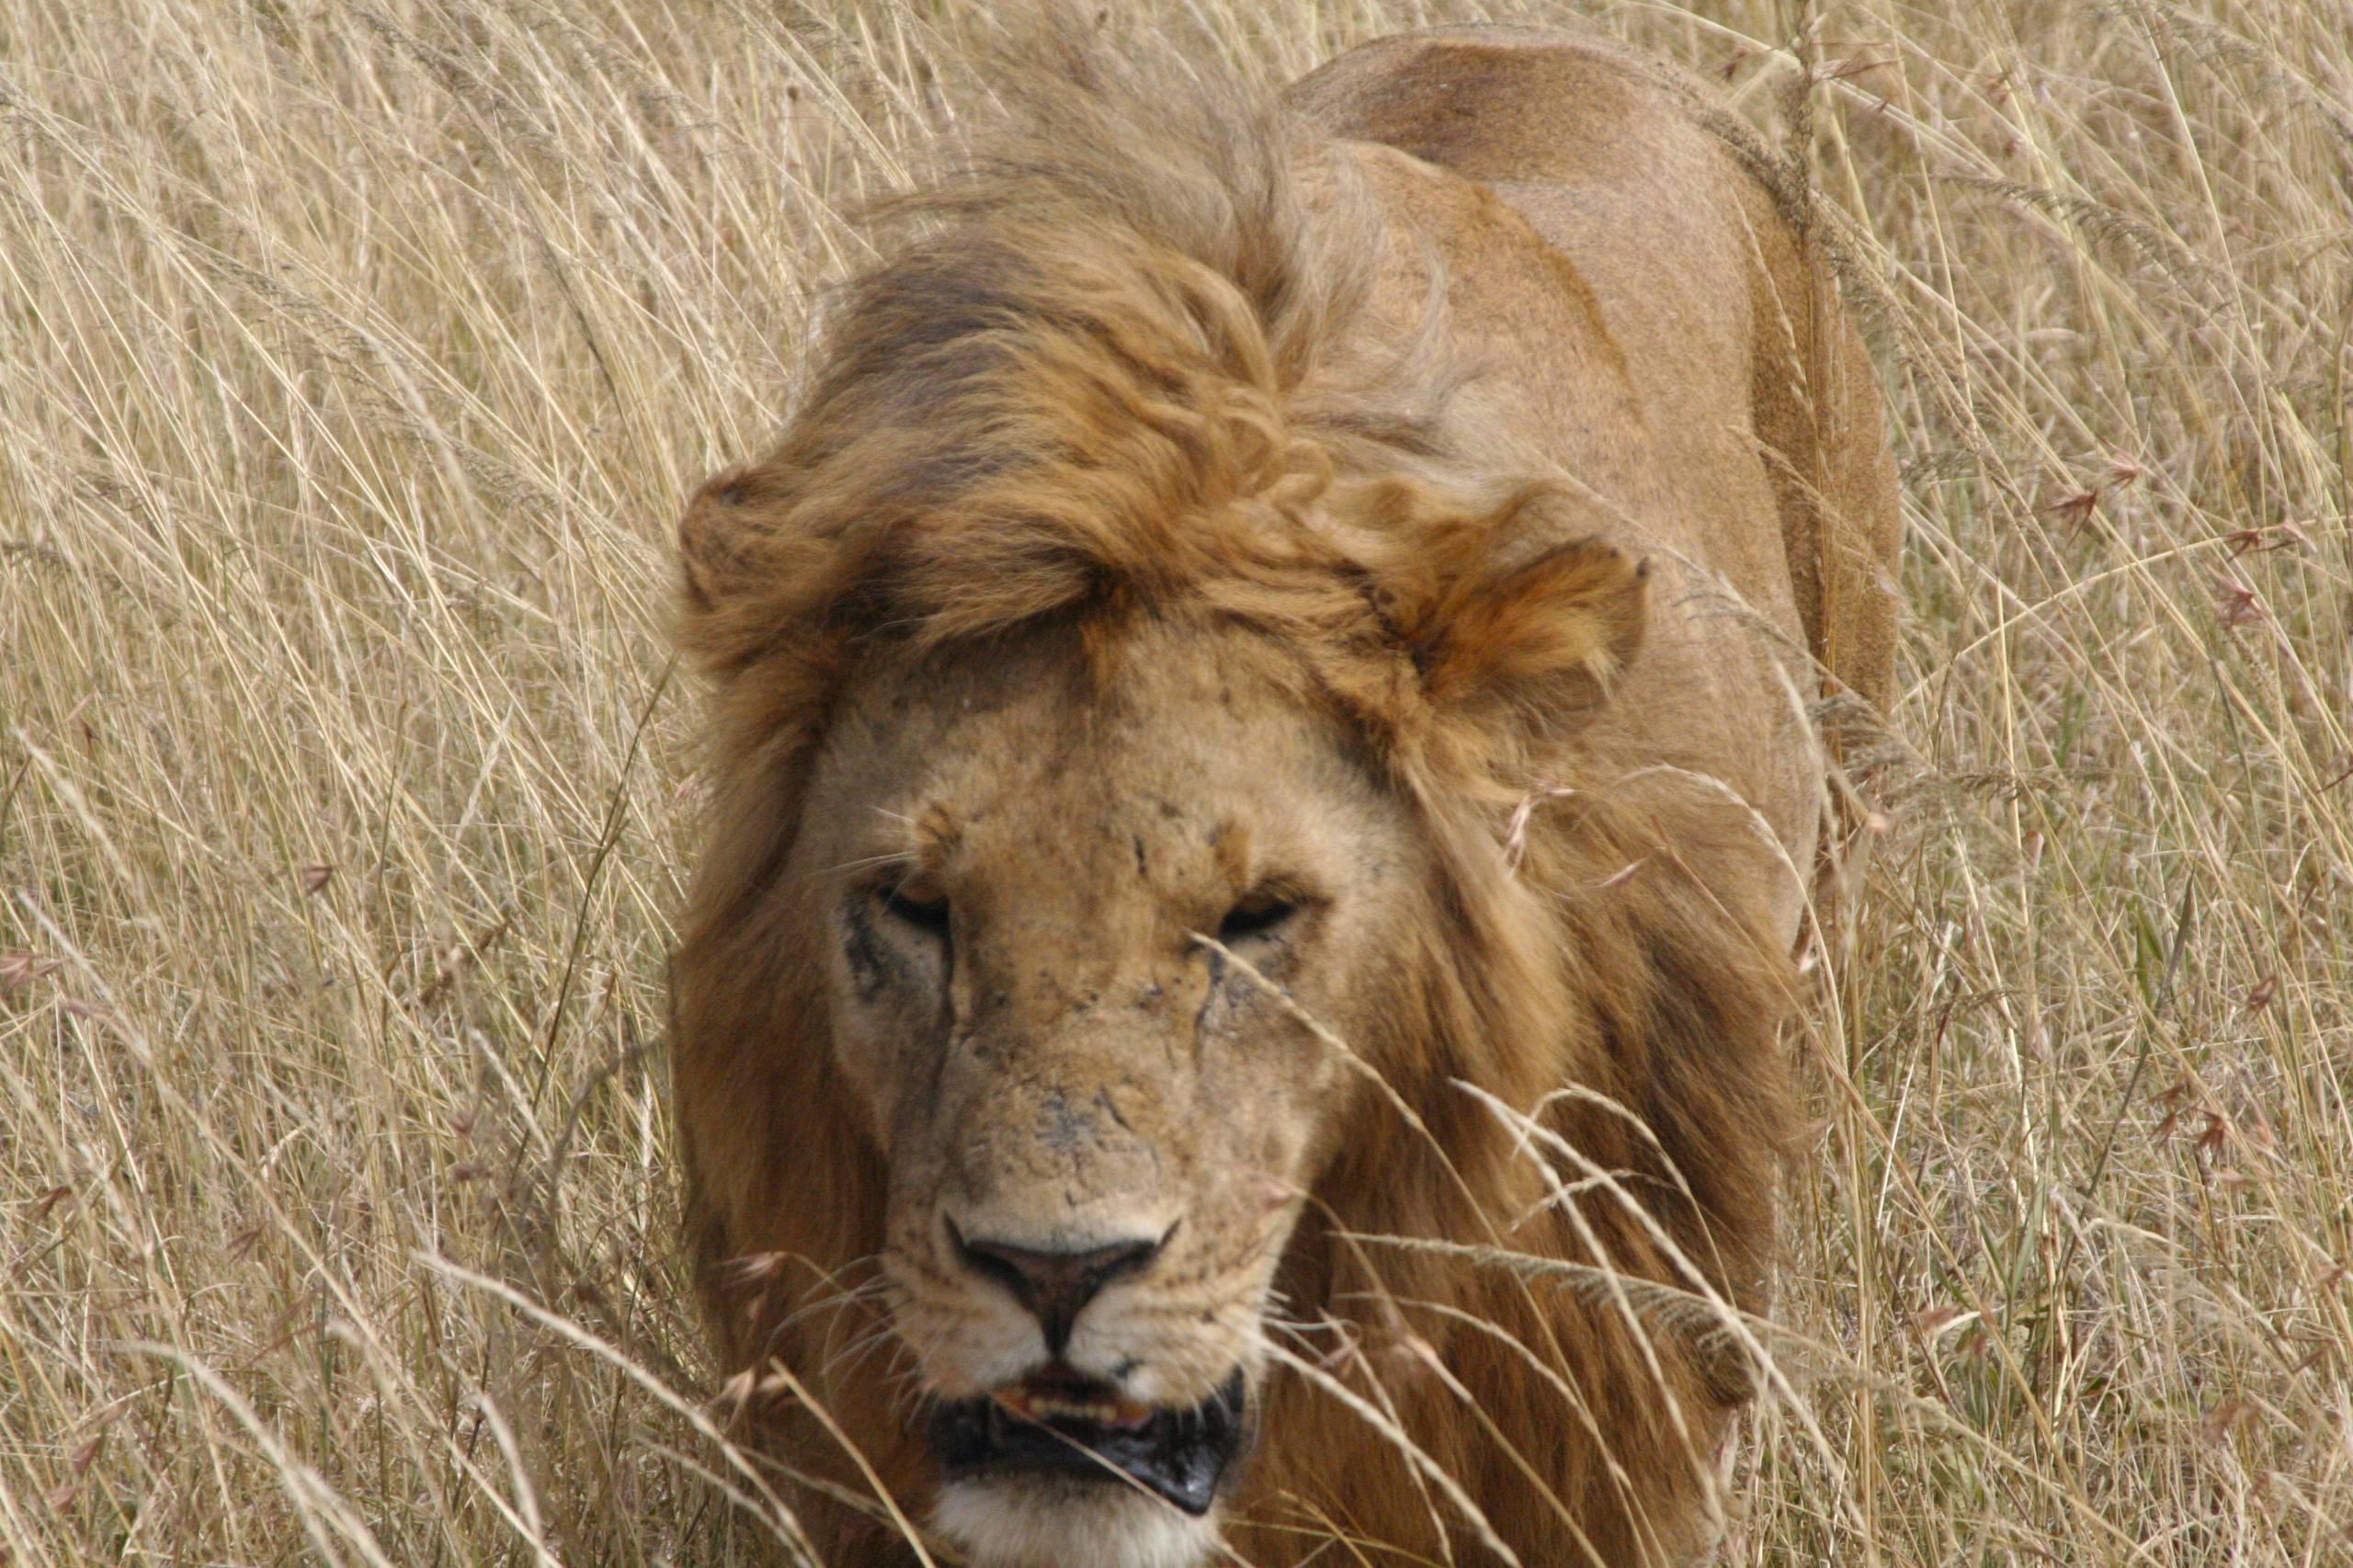 Lions of the Maasai Mara, alarming and amorous ...